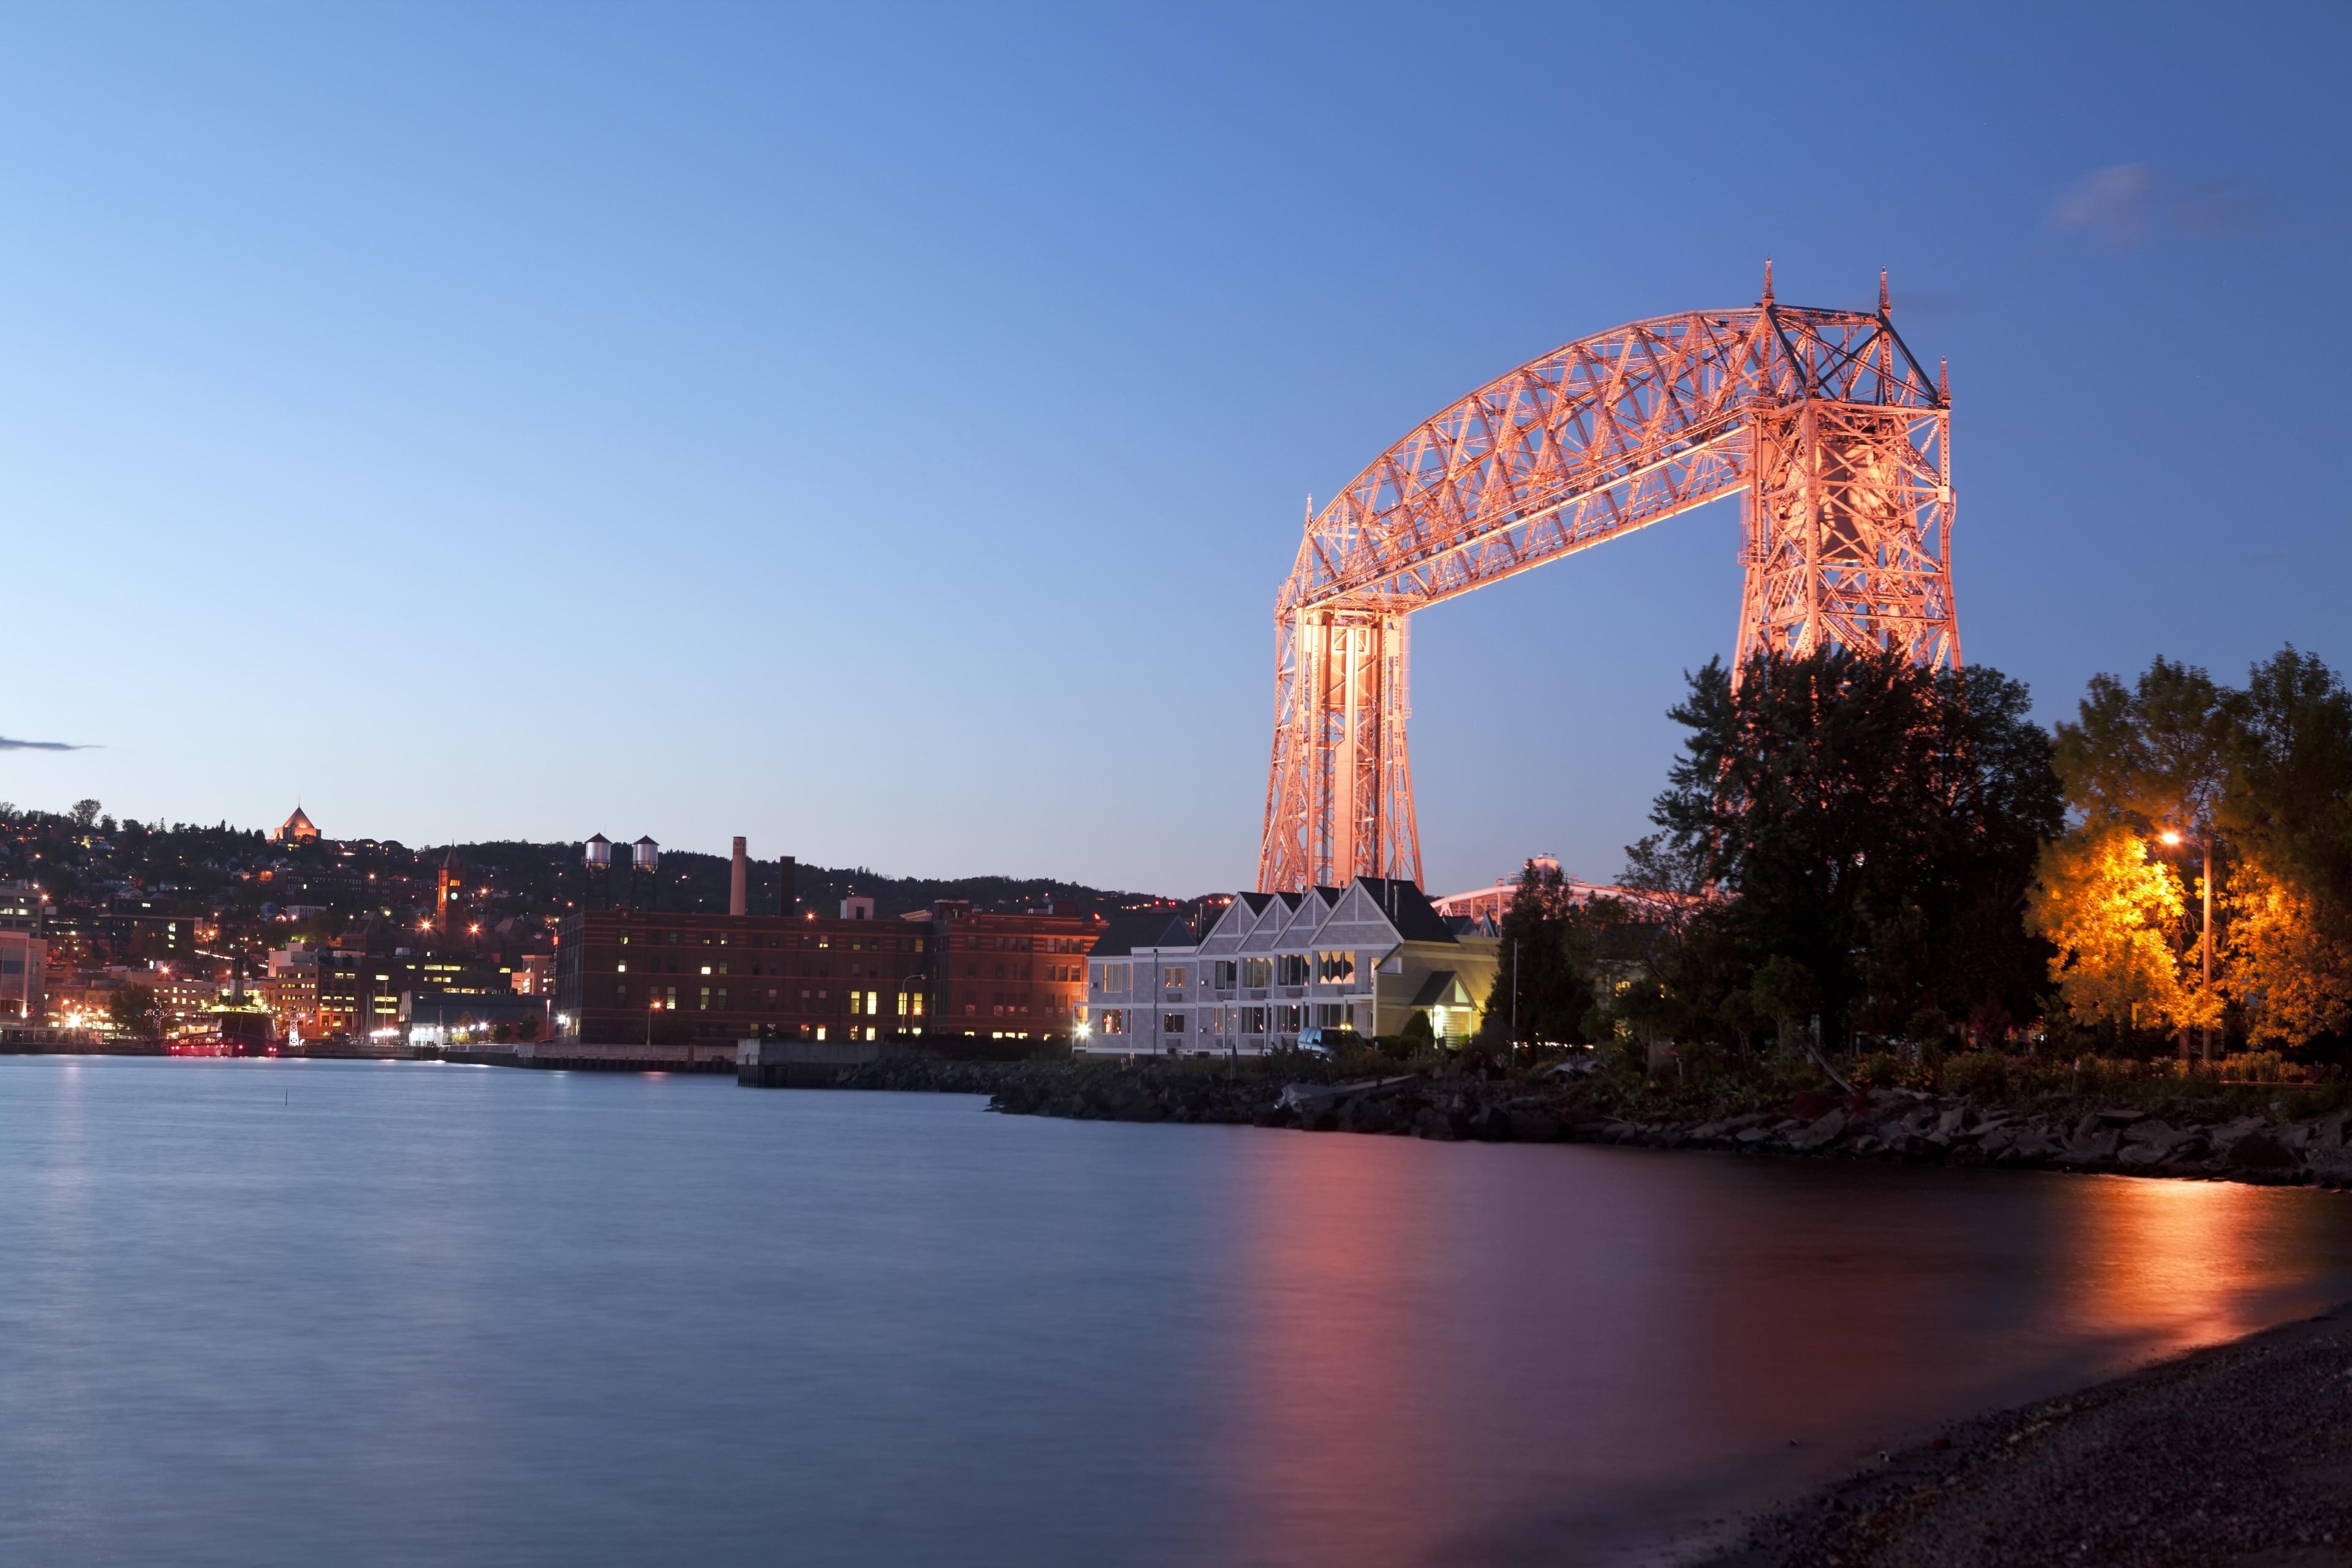 Park Point, Duluth, Minnesota, United States of America